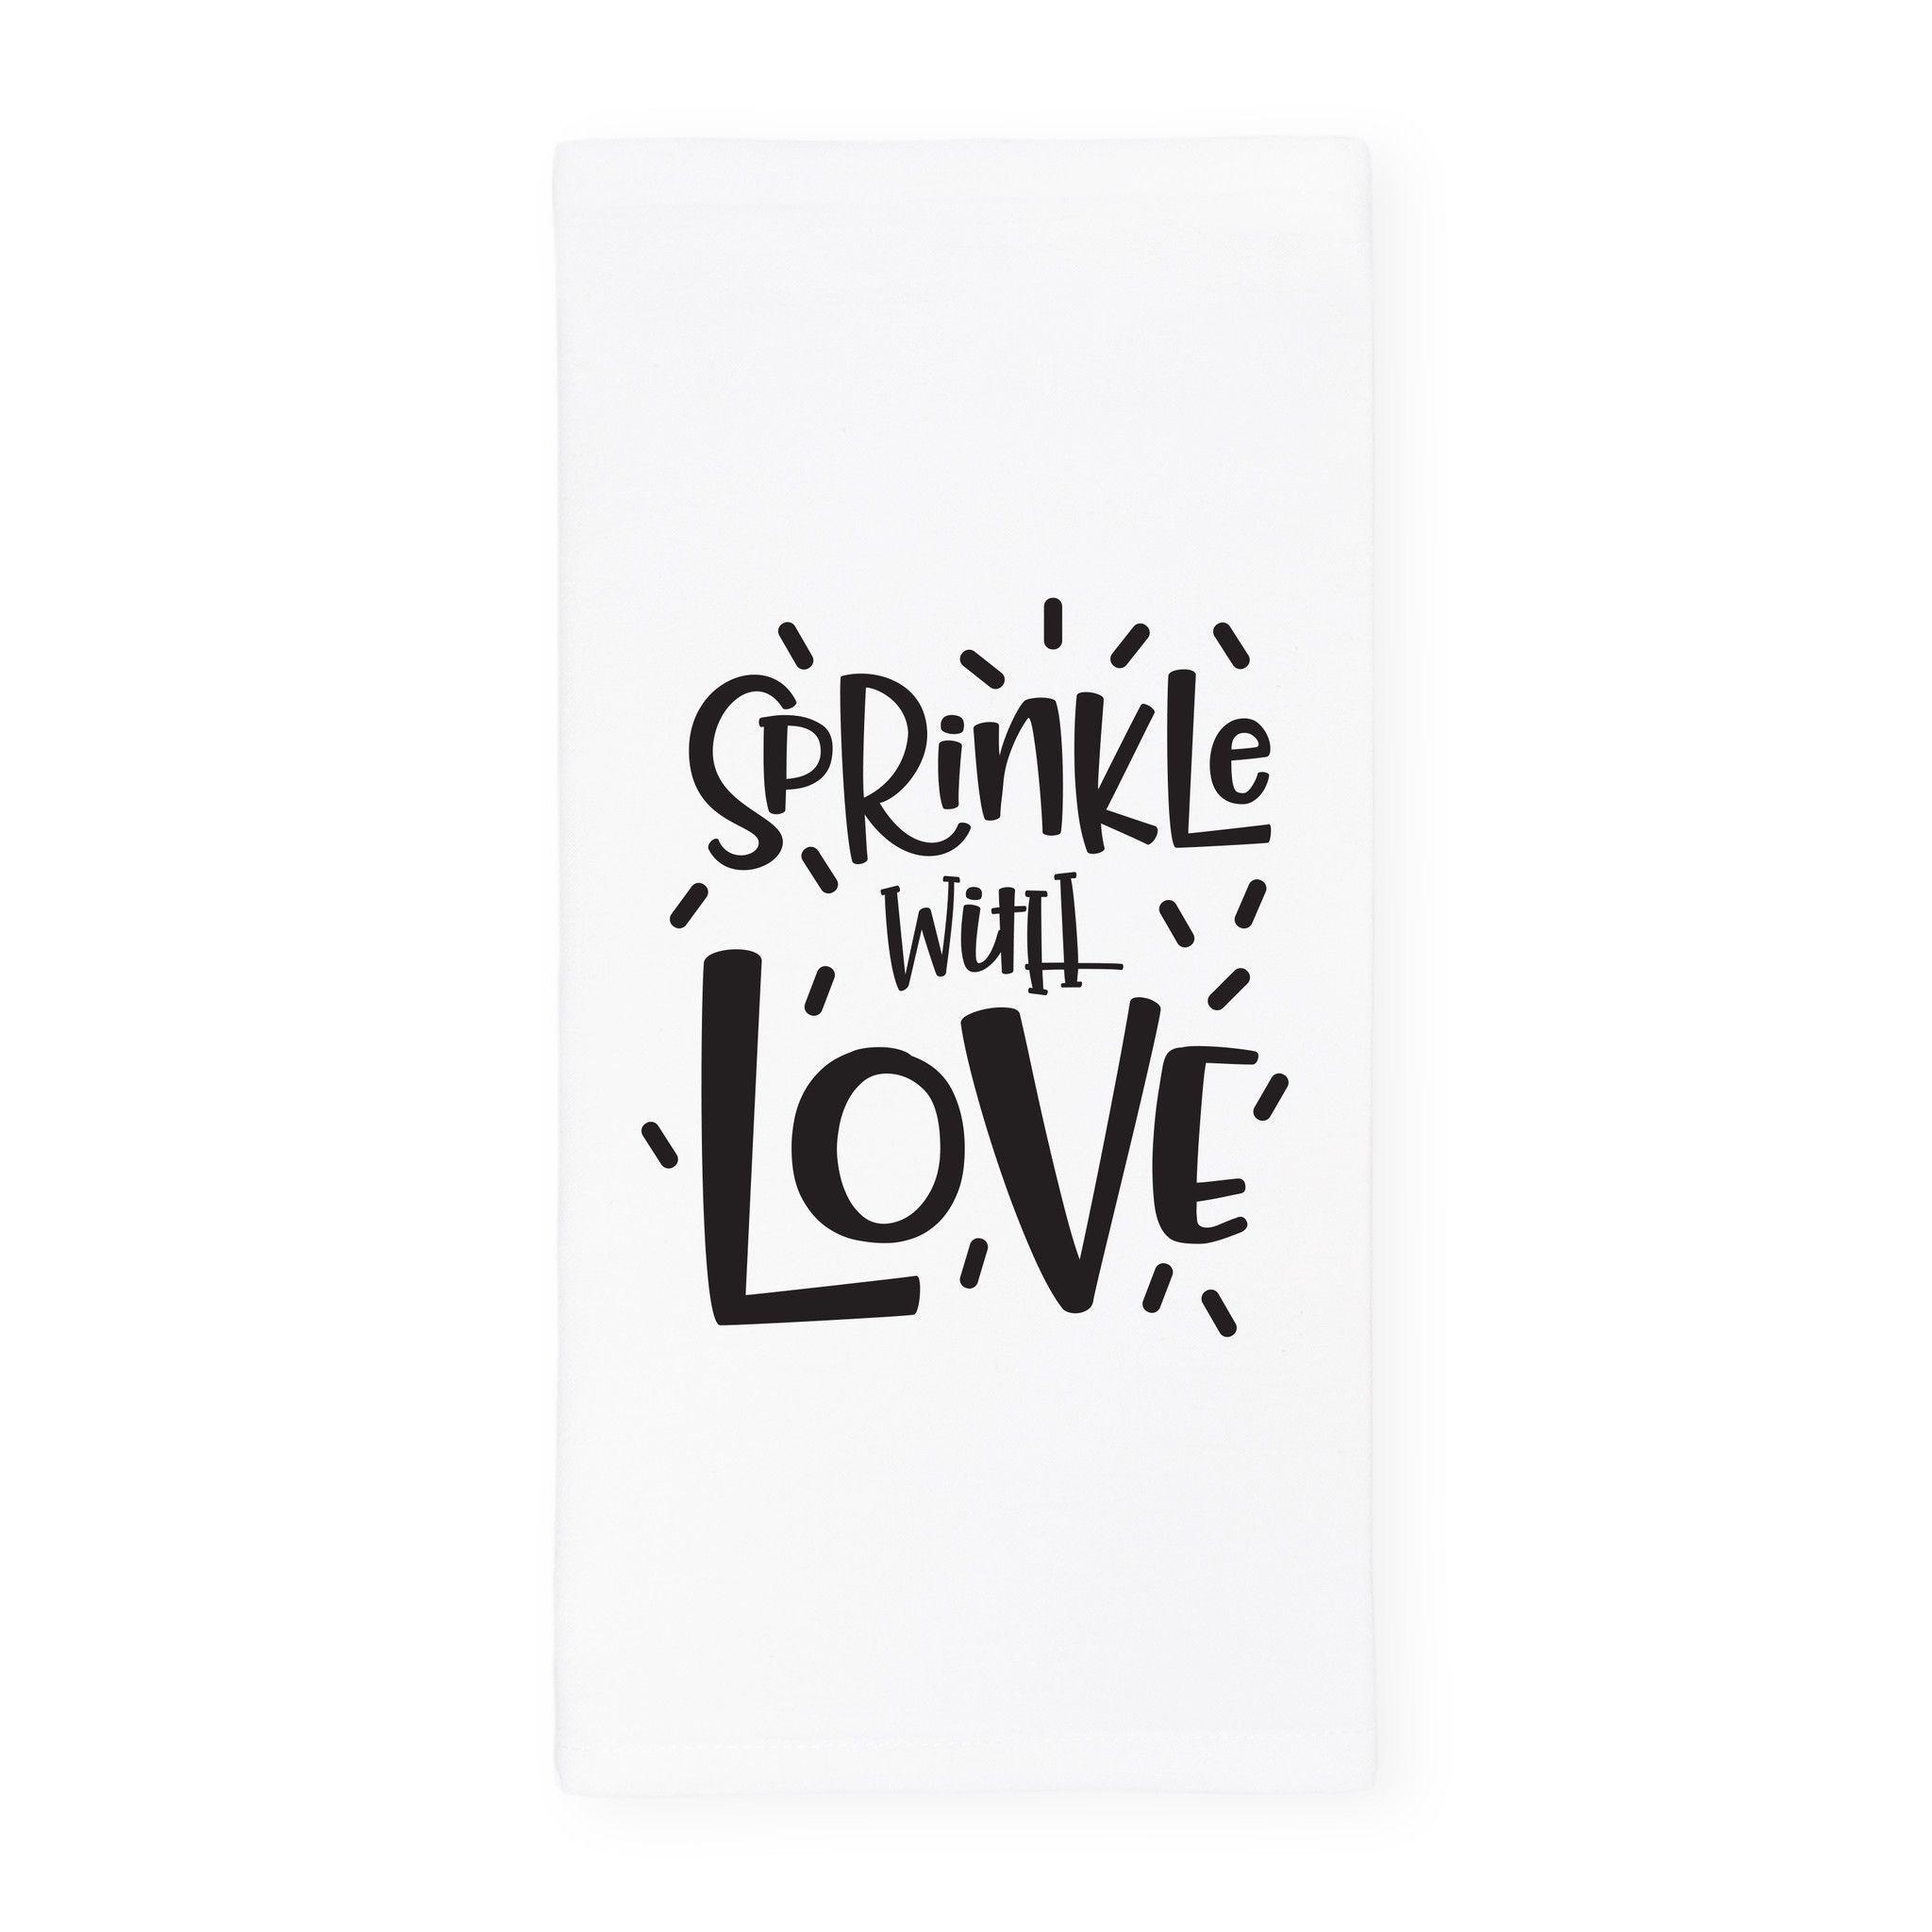 Boardmans Wedding Gift Registry: Sprinkle With Love Kitchen Tea Towel